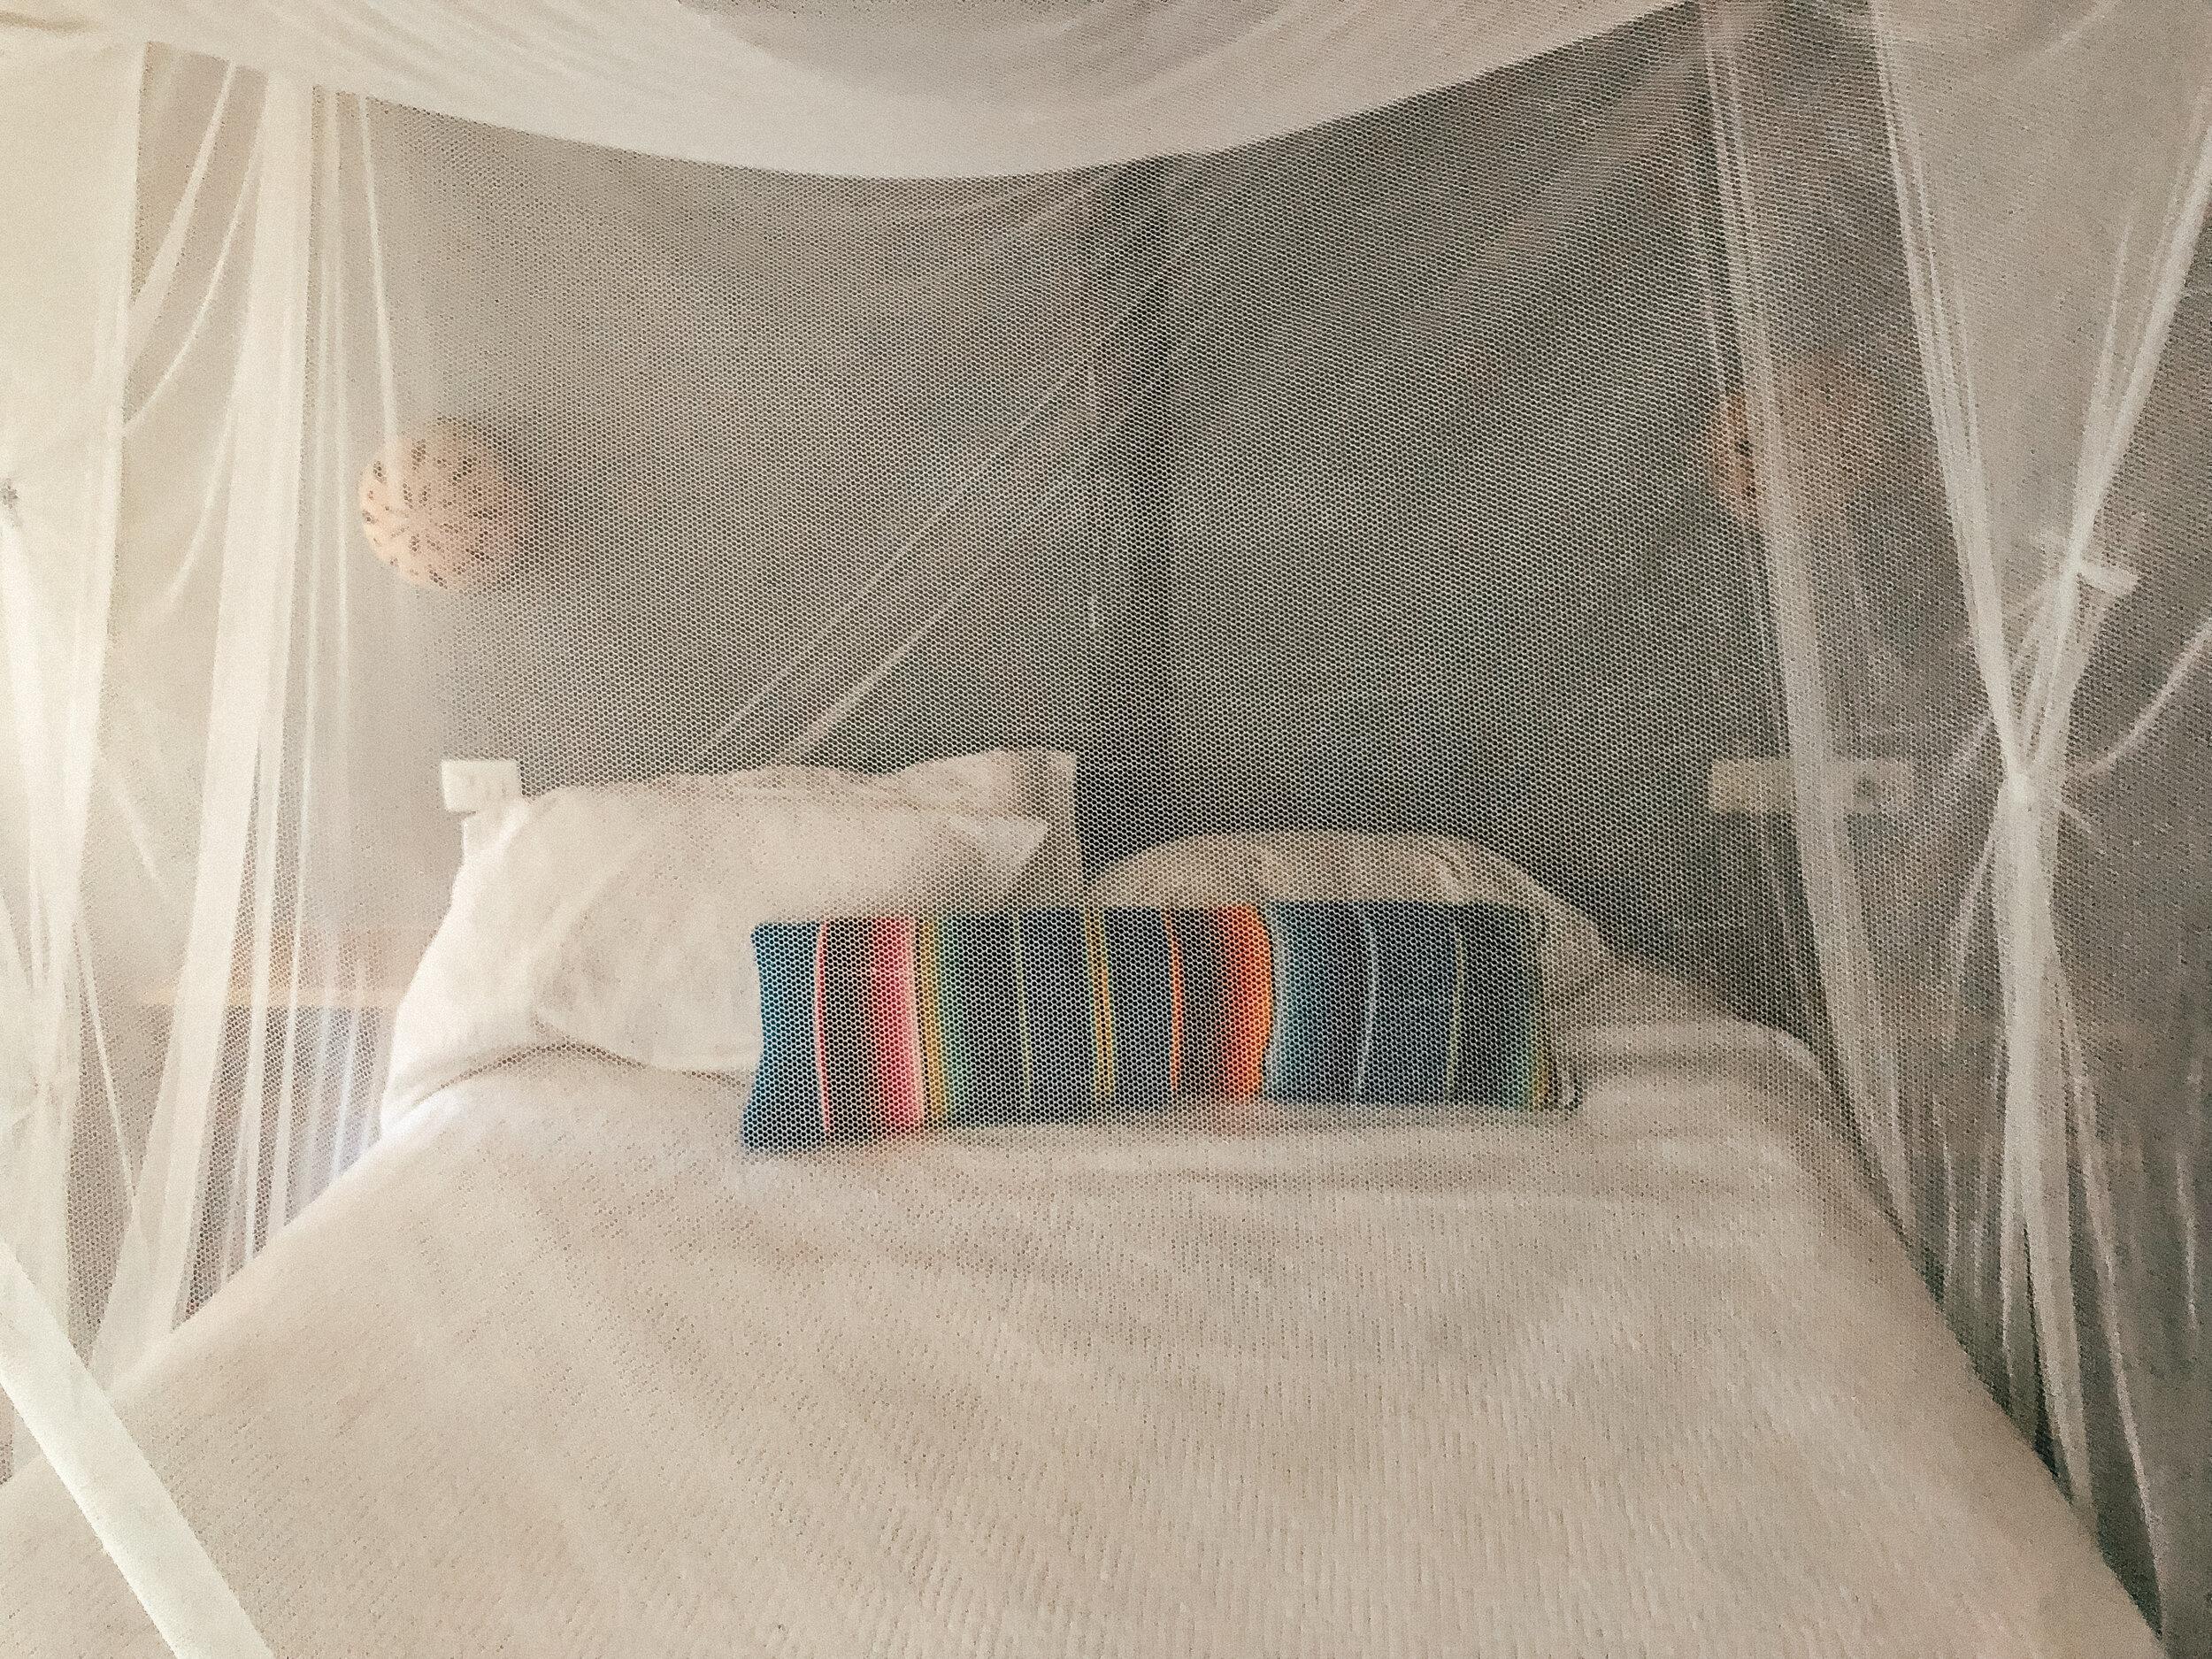 Tulum Tunich Jungle Cabañas Mosquito Net